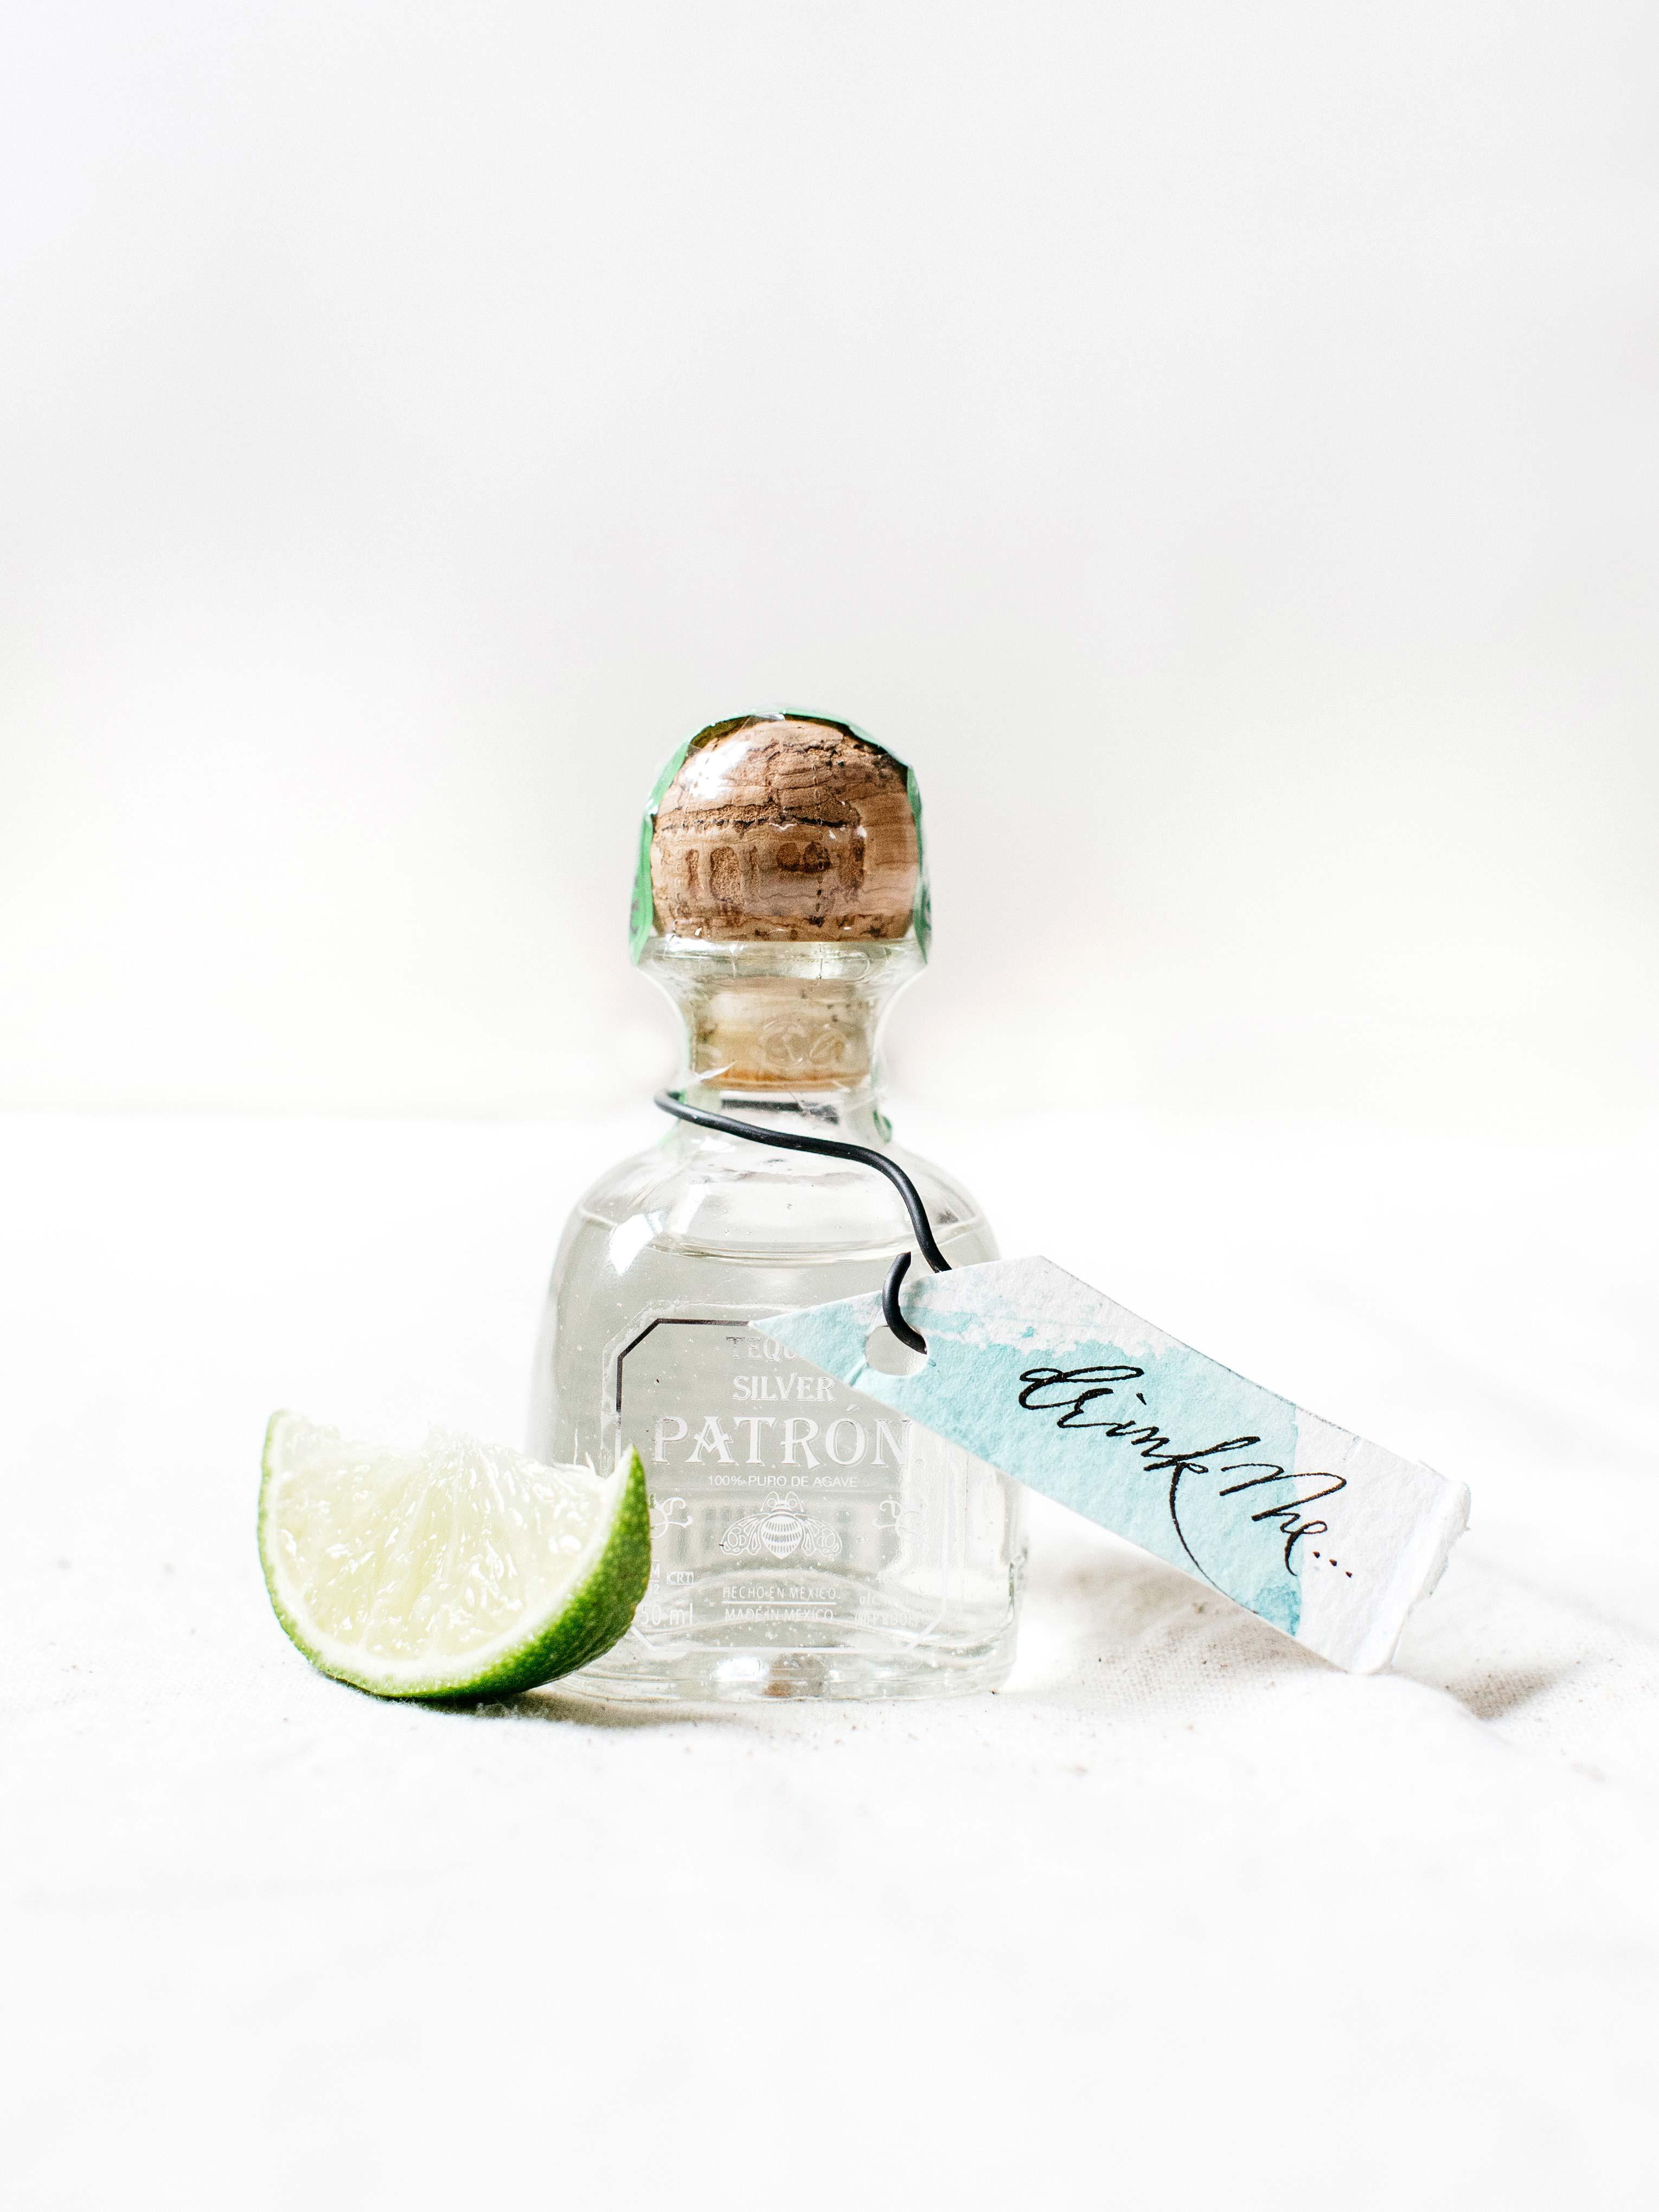 mini patron bottle